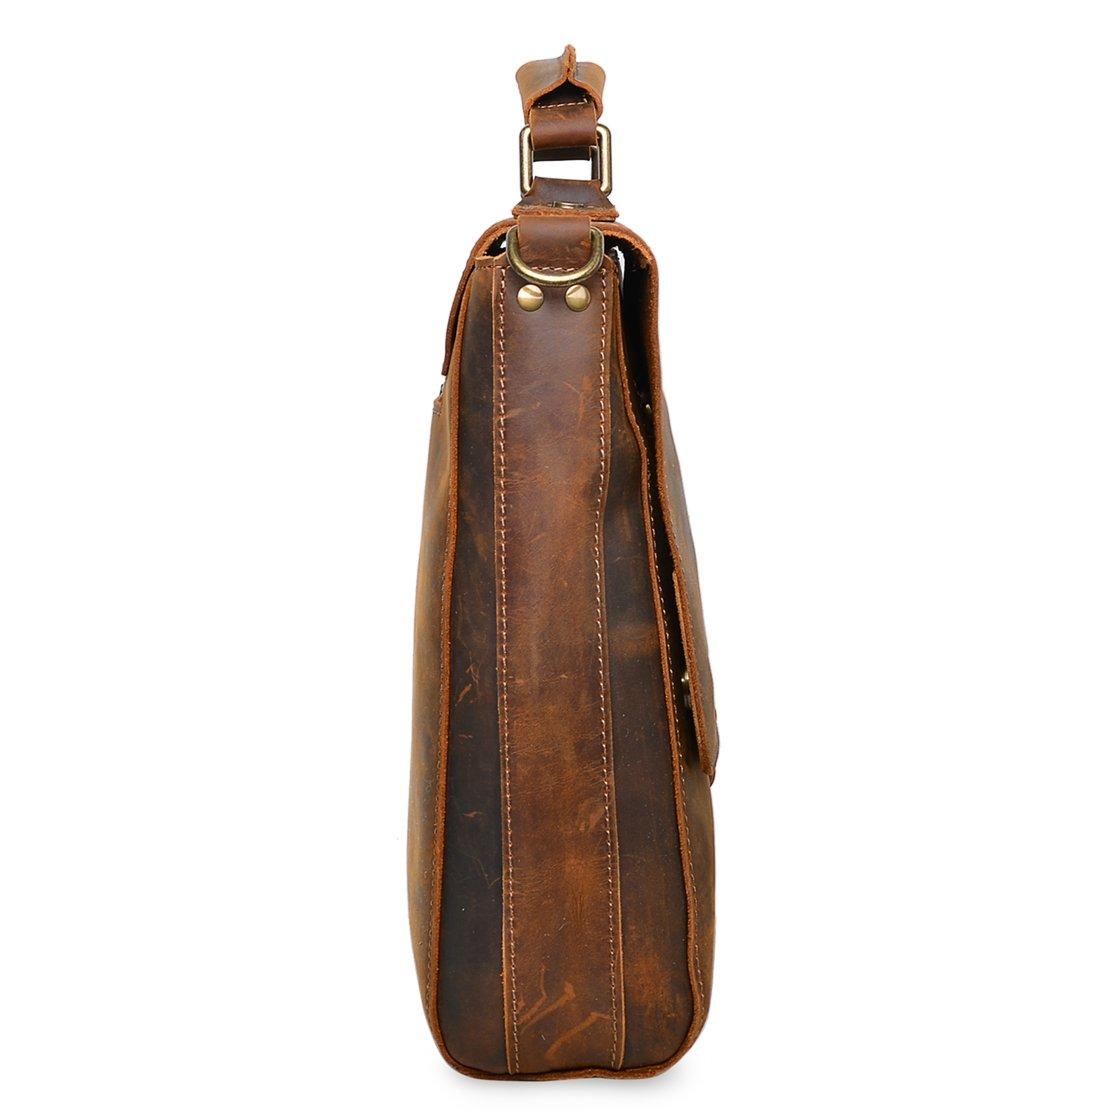 ALTOSY Vintage Genuine Leather Business Laptop Briefcase Office Shoulder Bag 8127 (Brown) by Altosy (Image #4)